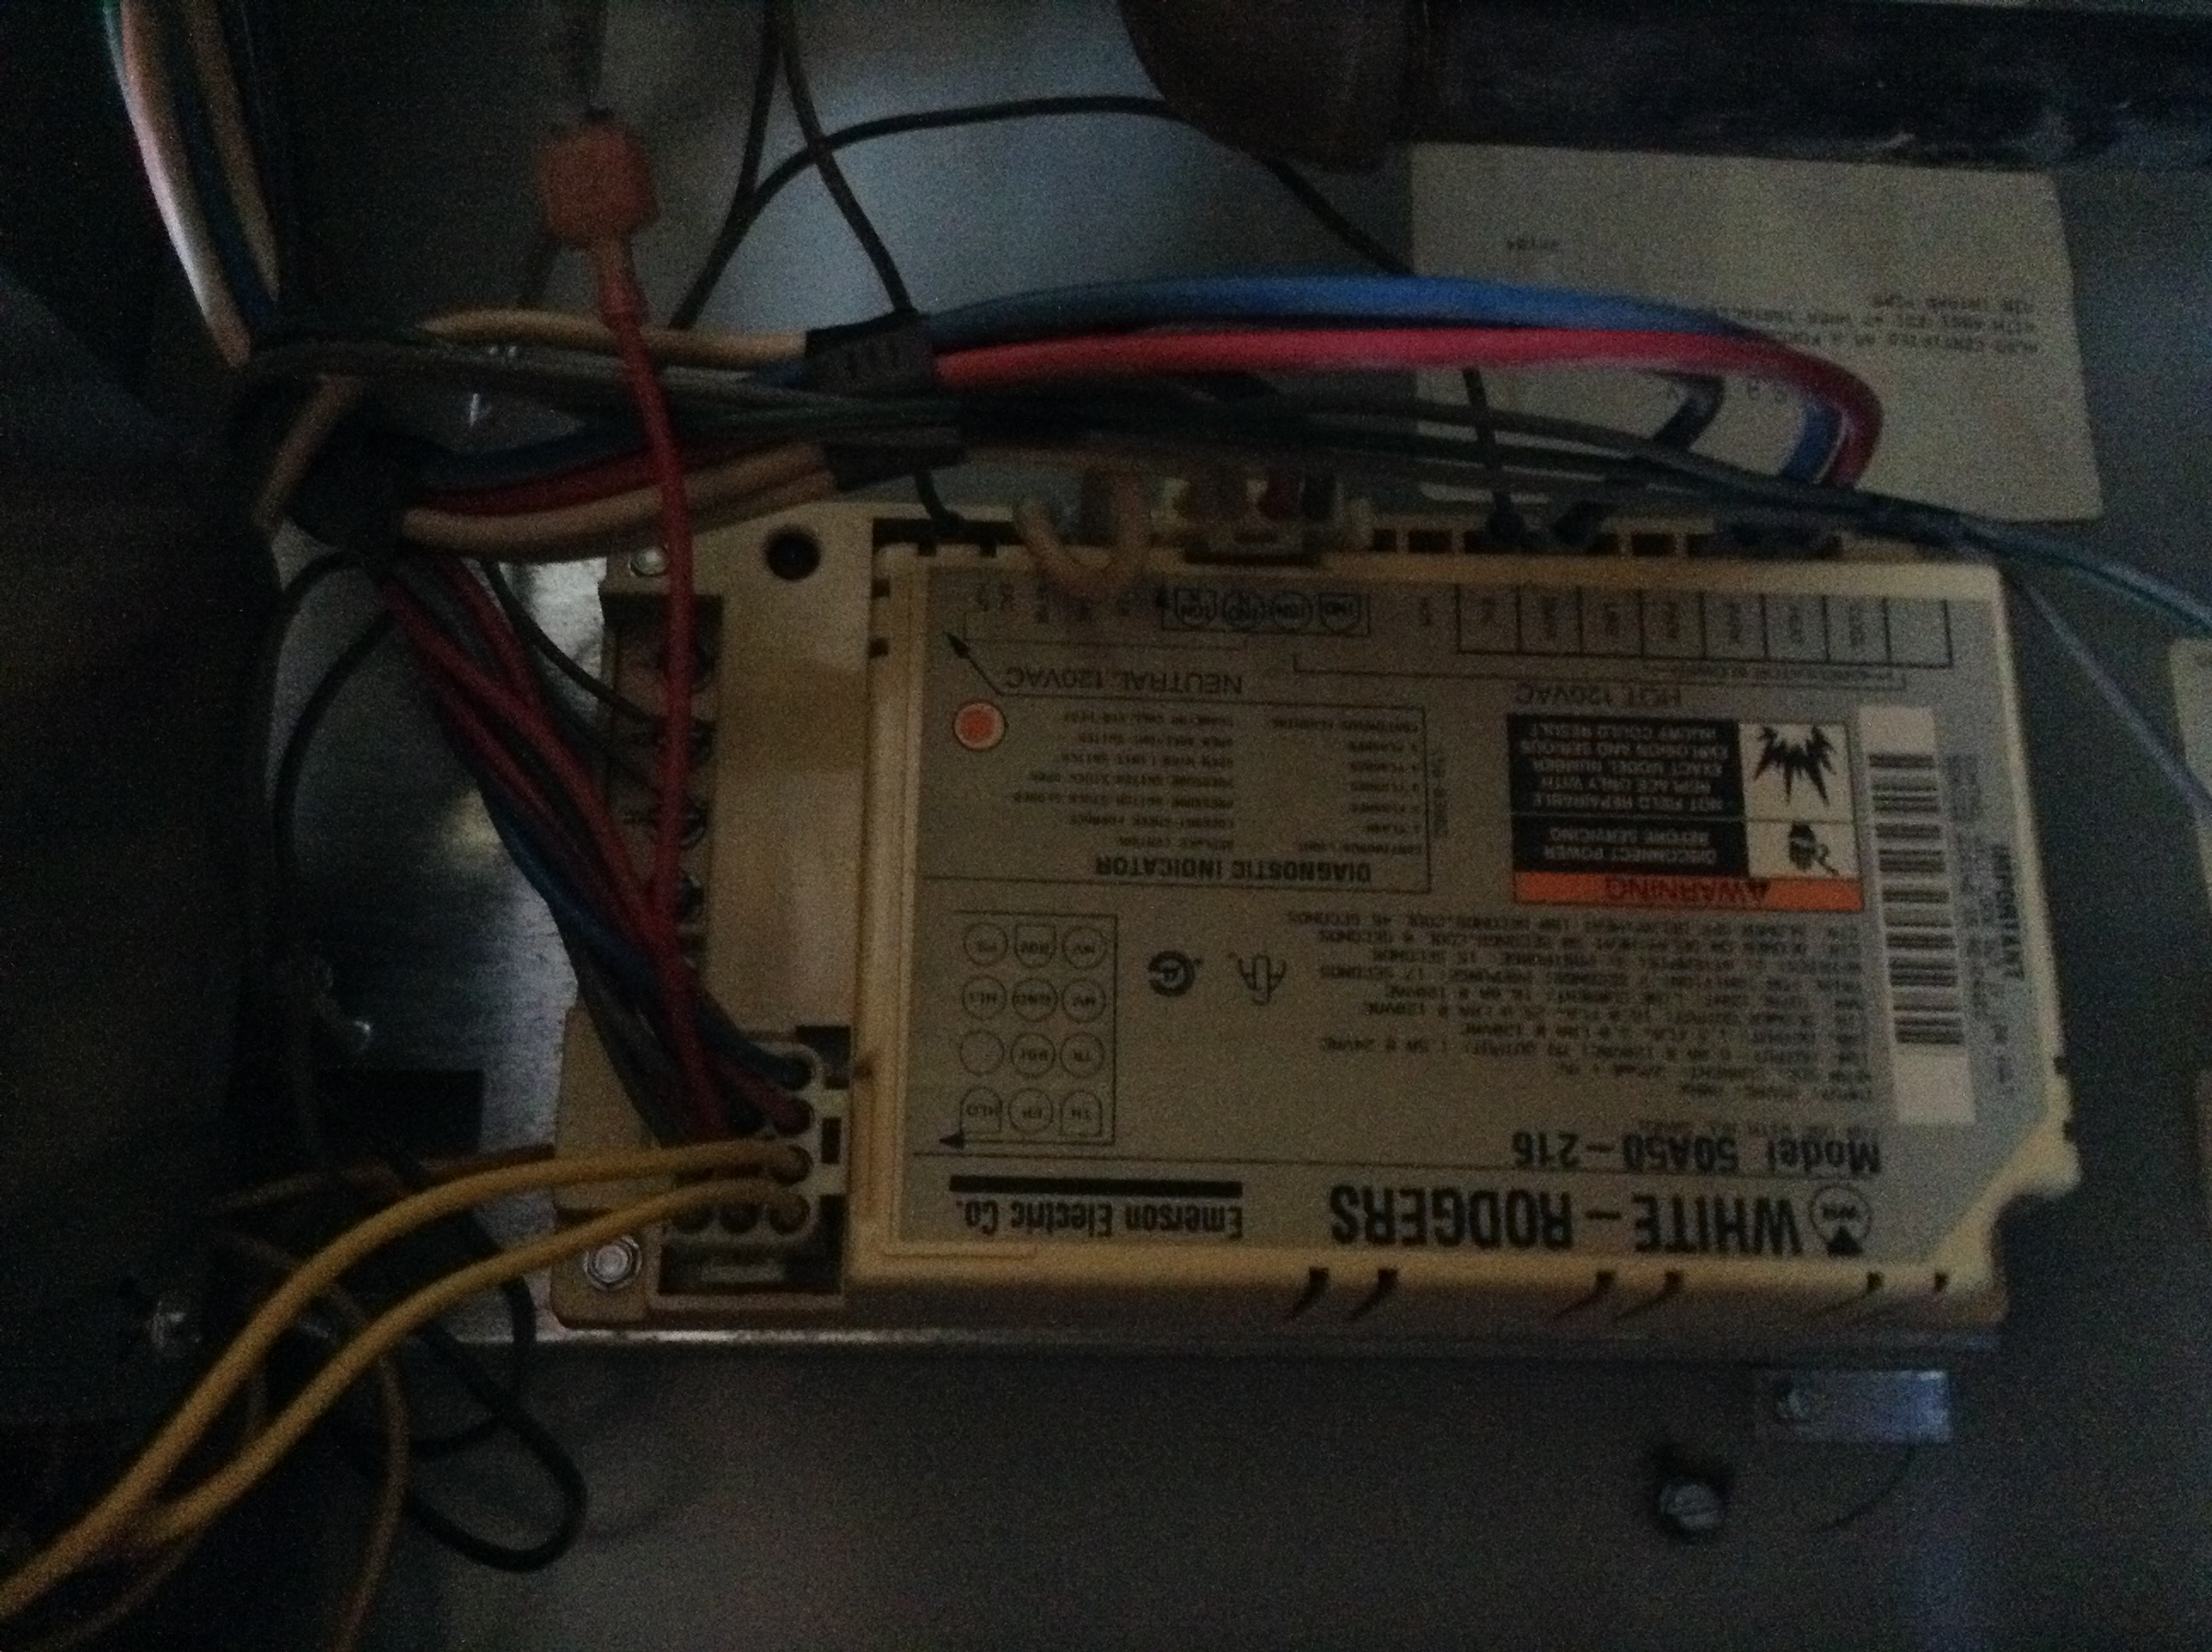 Olsen Gas Furnace Stopped Working The Red Flashing Light Is Blinking Wiring Diagram Imagejpegimagejpeg